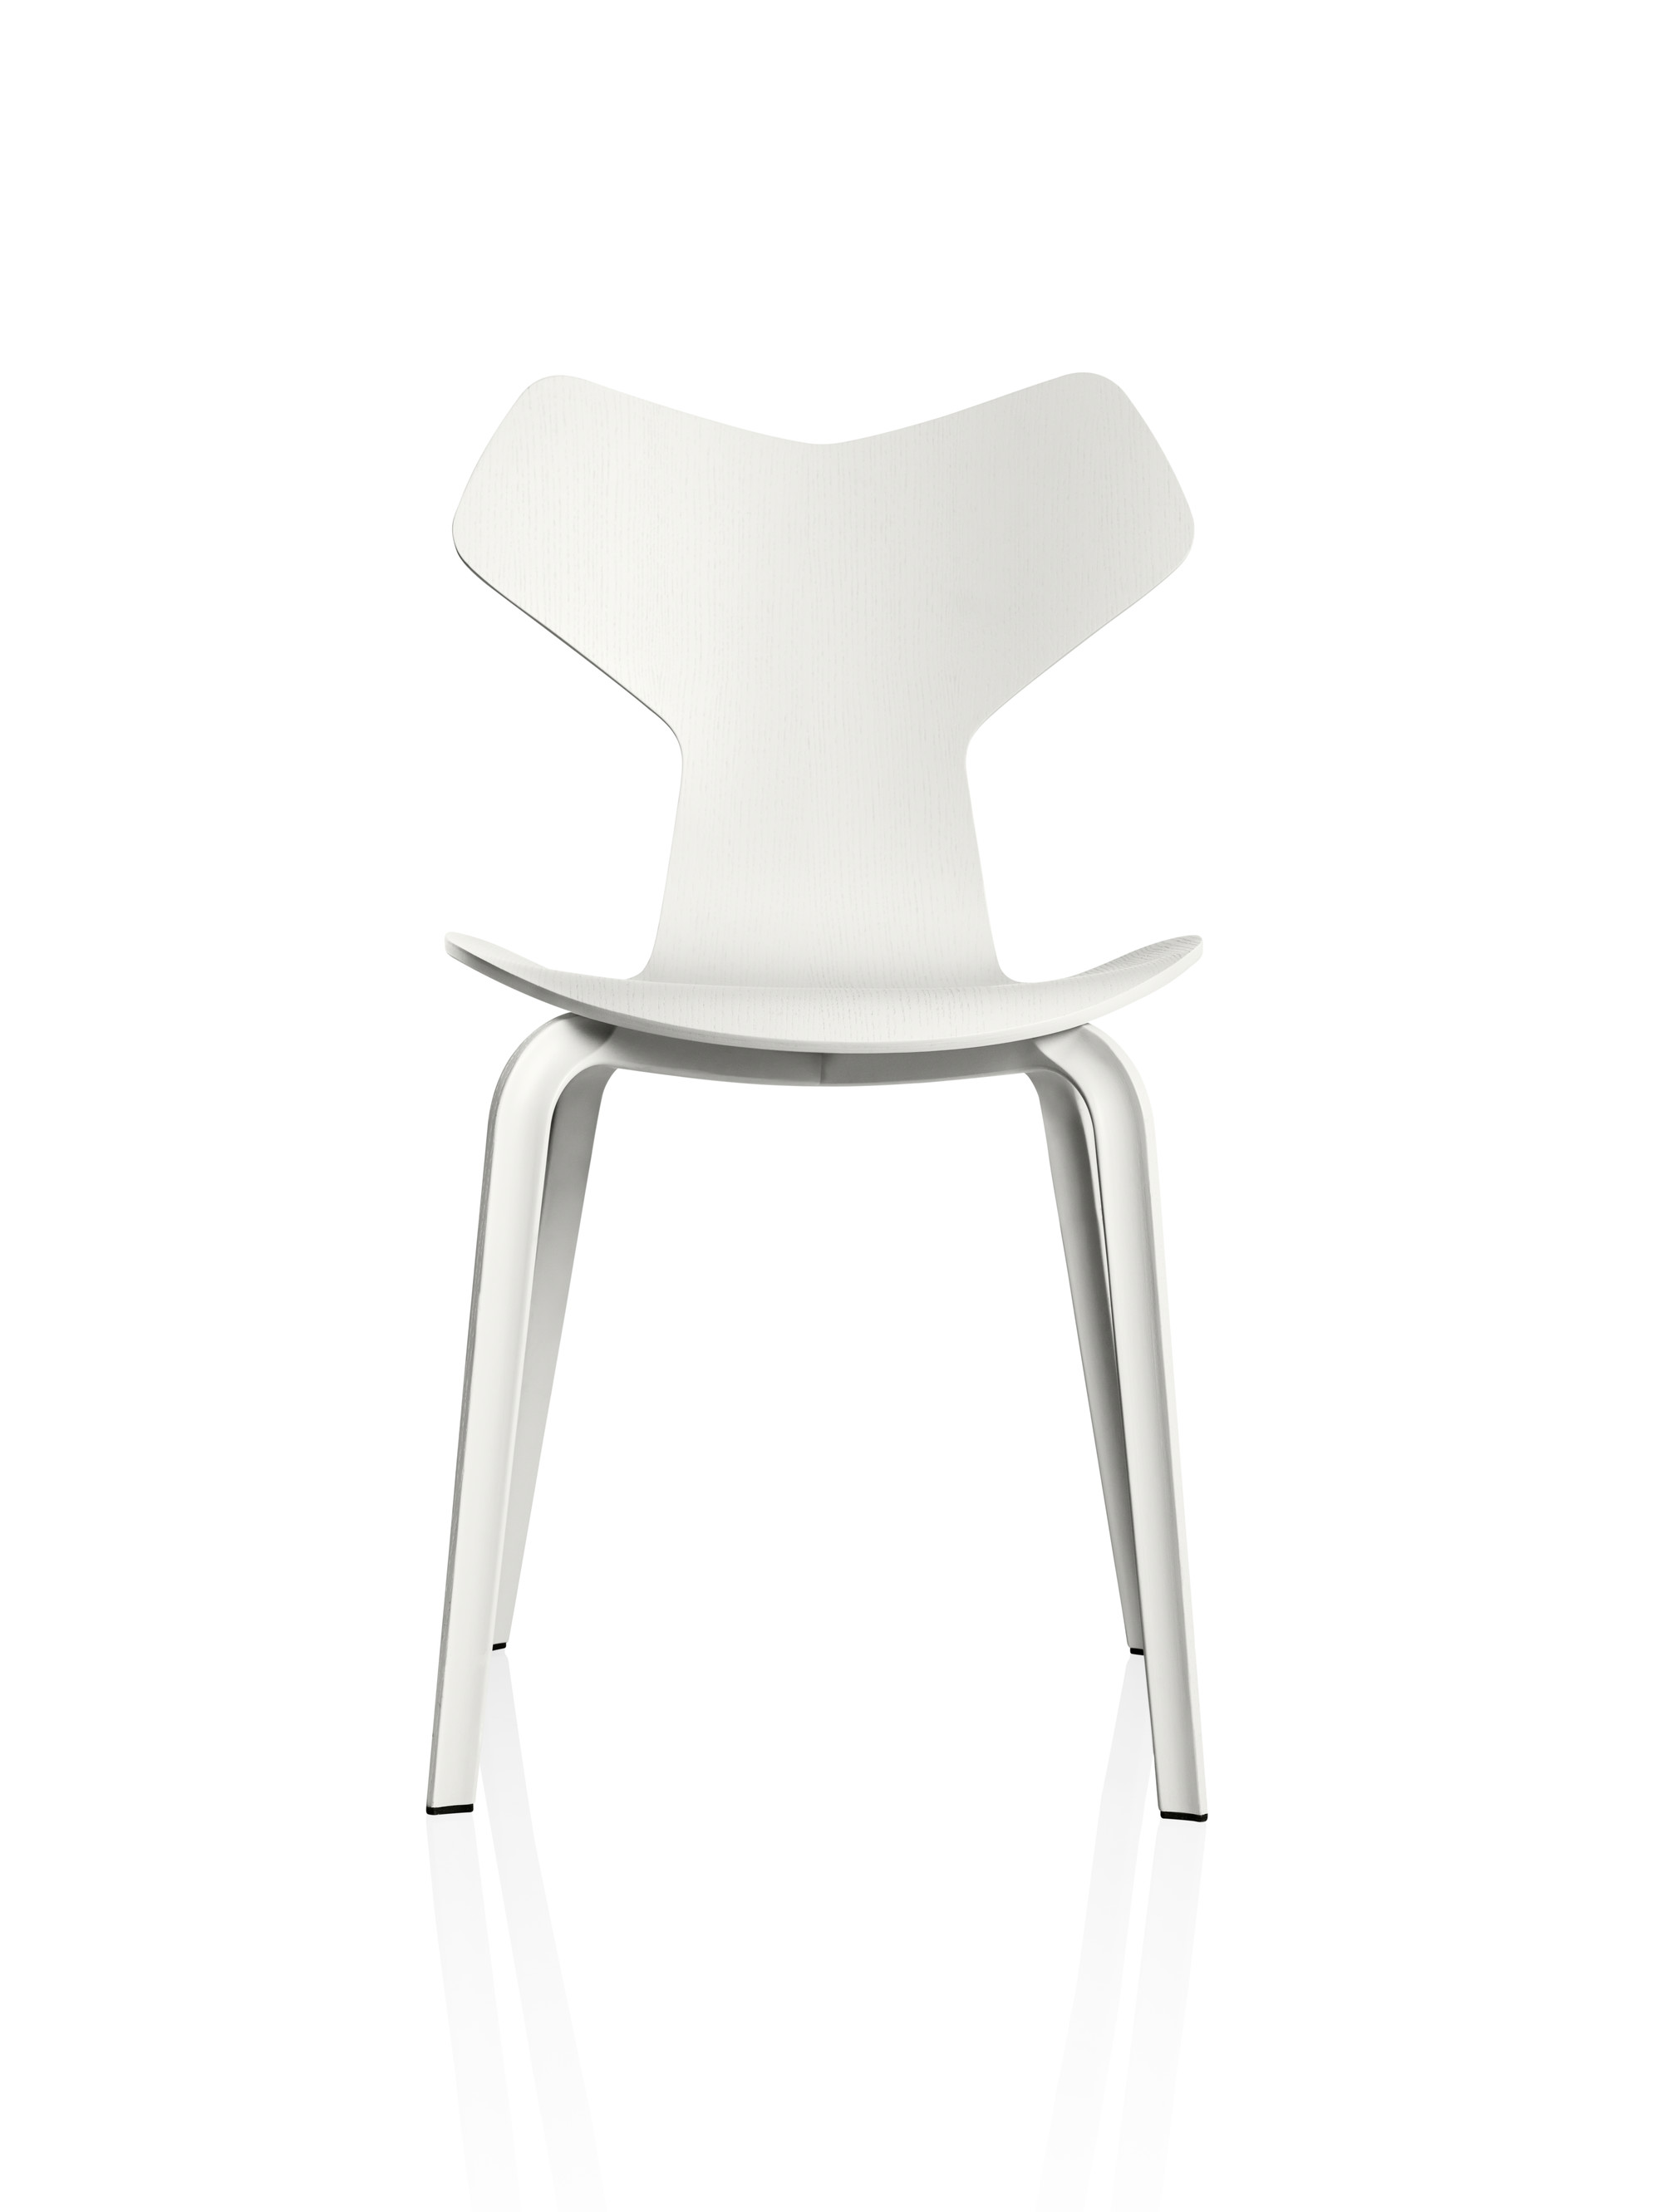 fritz hansen chaise grand prix design arne jacobsen. Black Bedroom Furniture Sets. Home Design Ideas